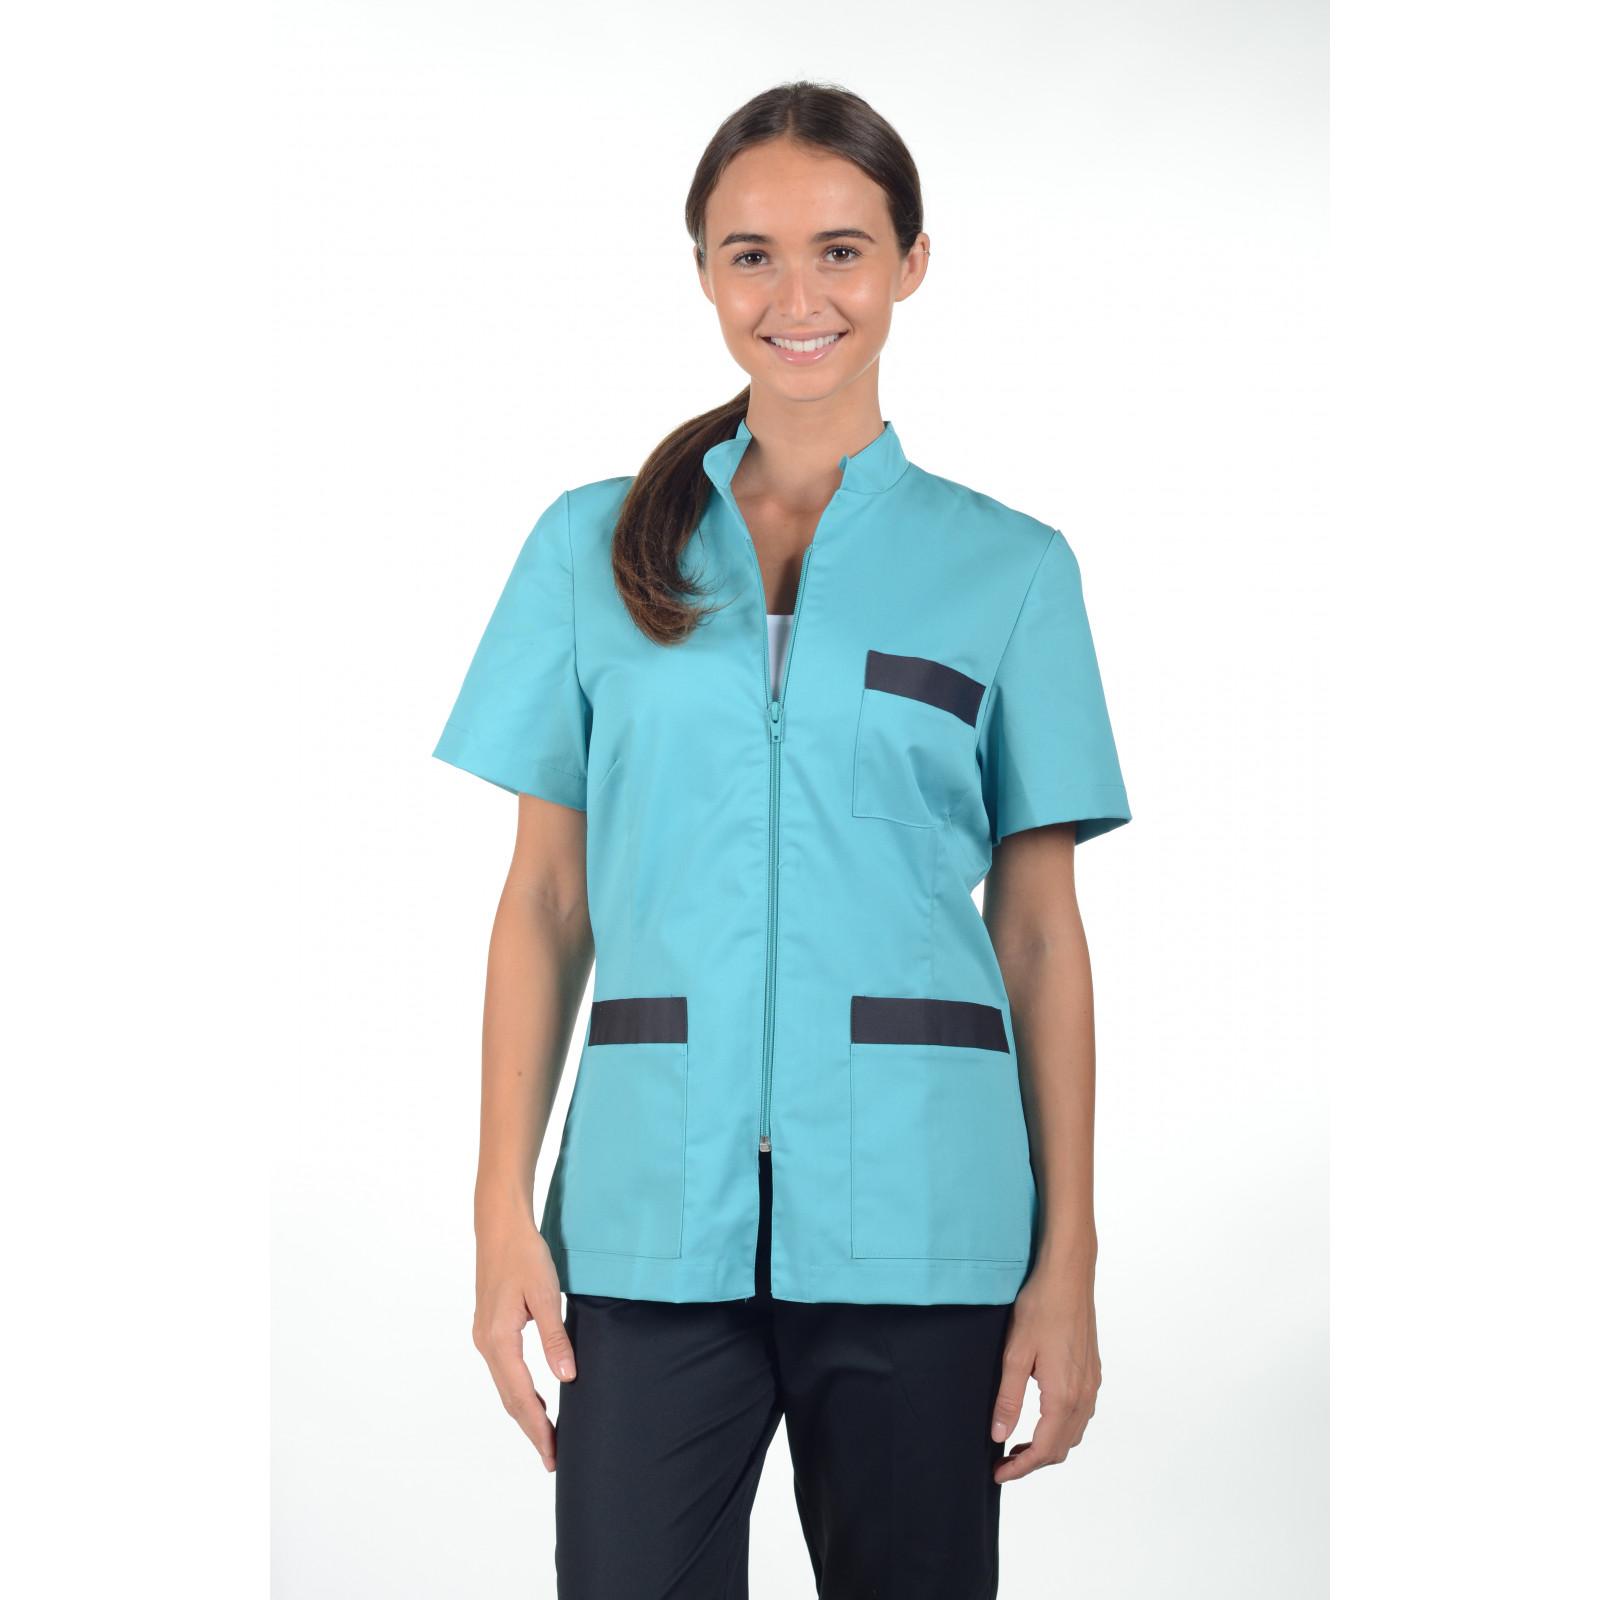 Blouse médicale Col Mao Zip femme, Mankaia factory Stretch (2496)